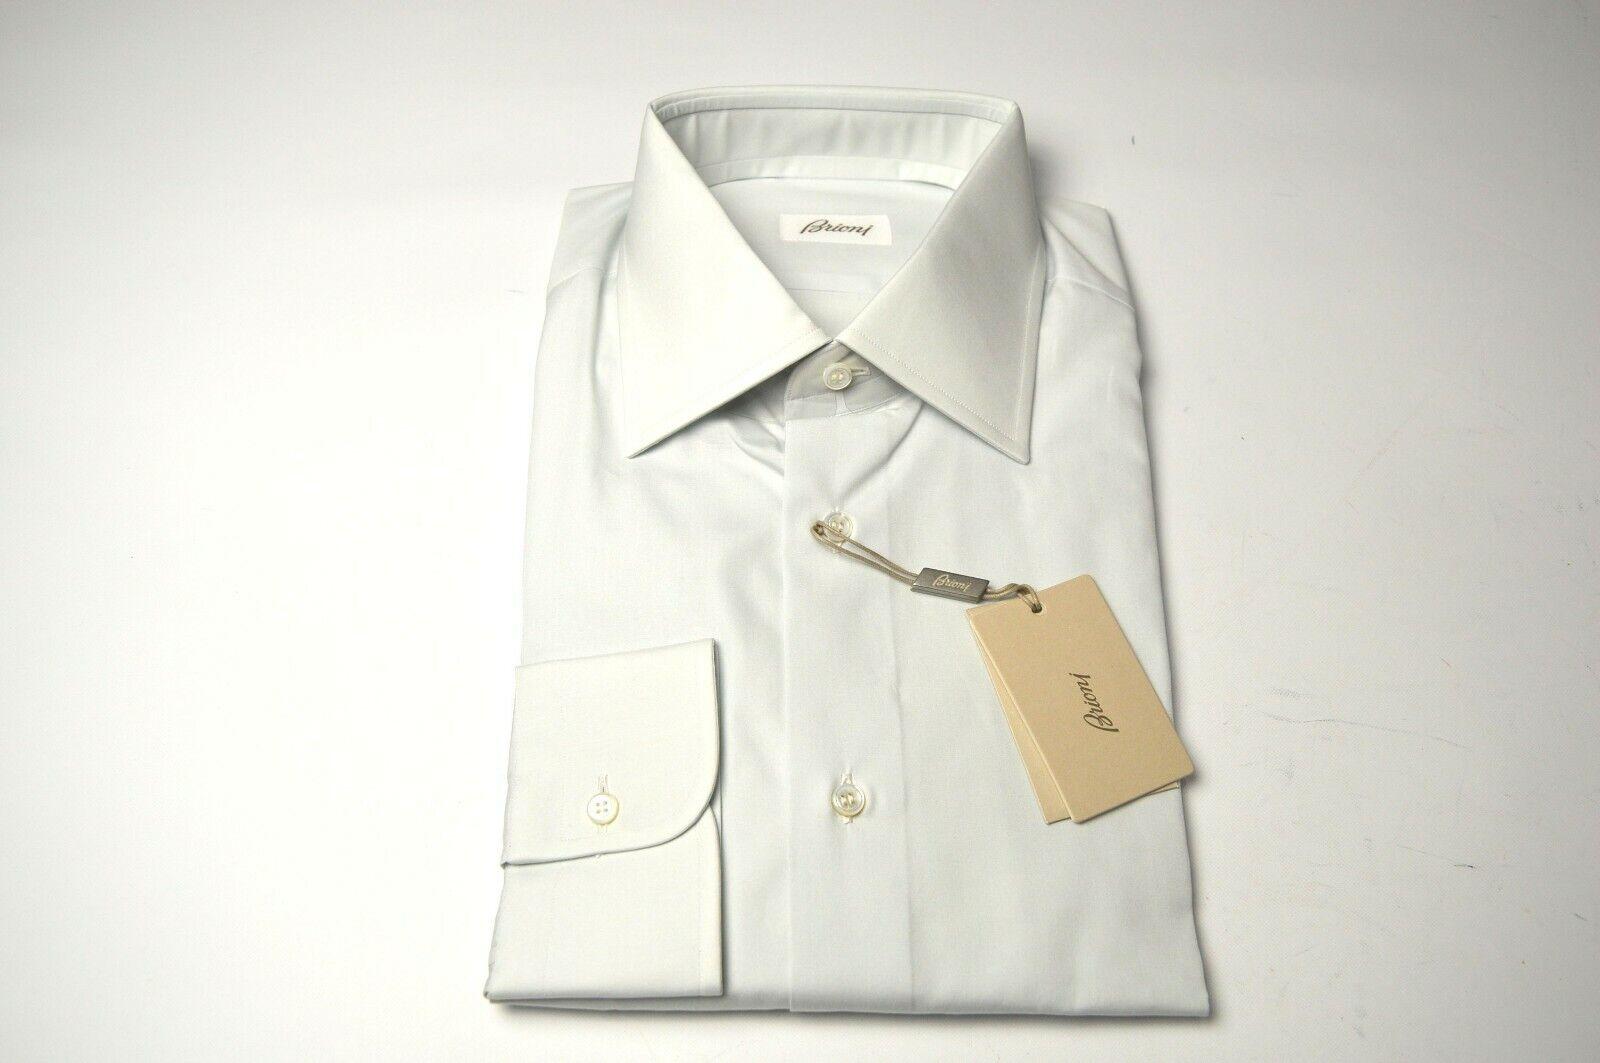 NEW  BRIONI Dress  hemd 100% baumwolle Größe 16 Us 41 Eu  (ARA231)